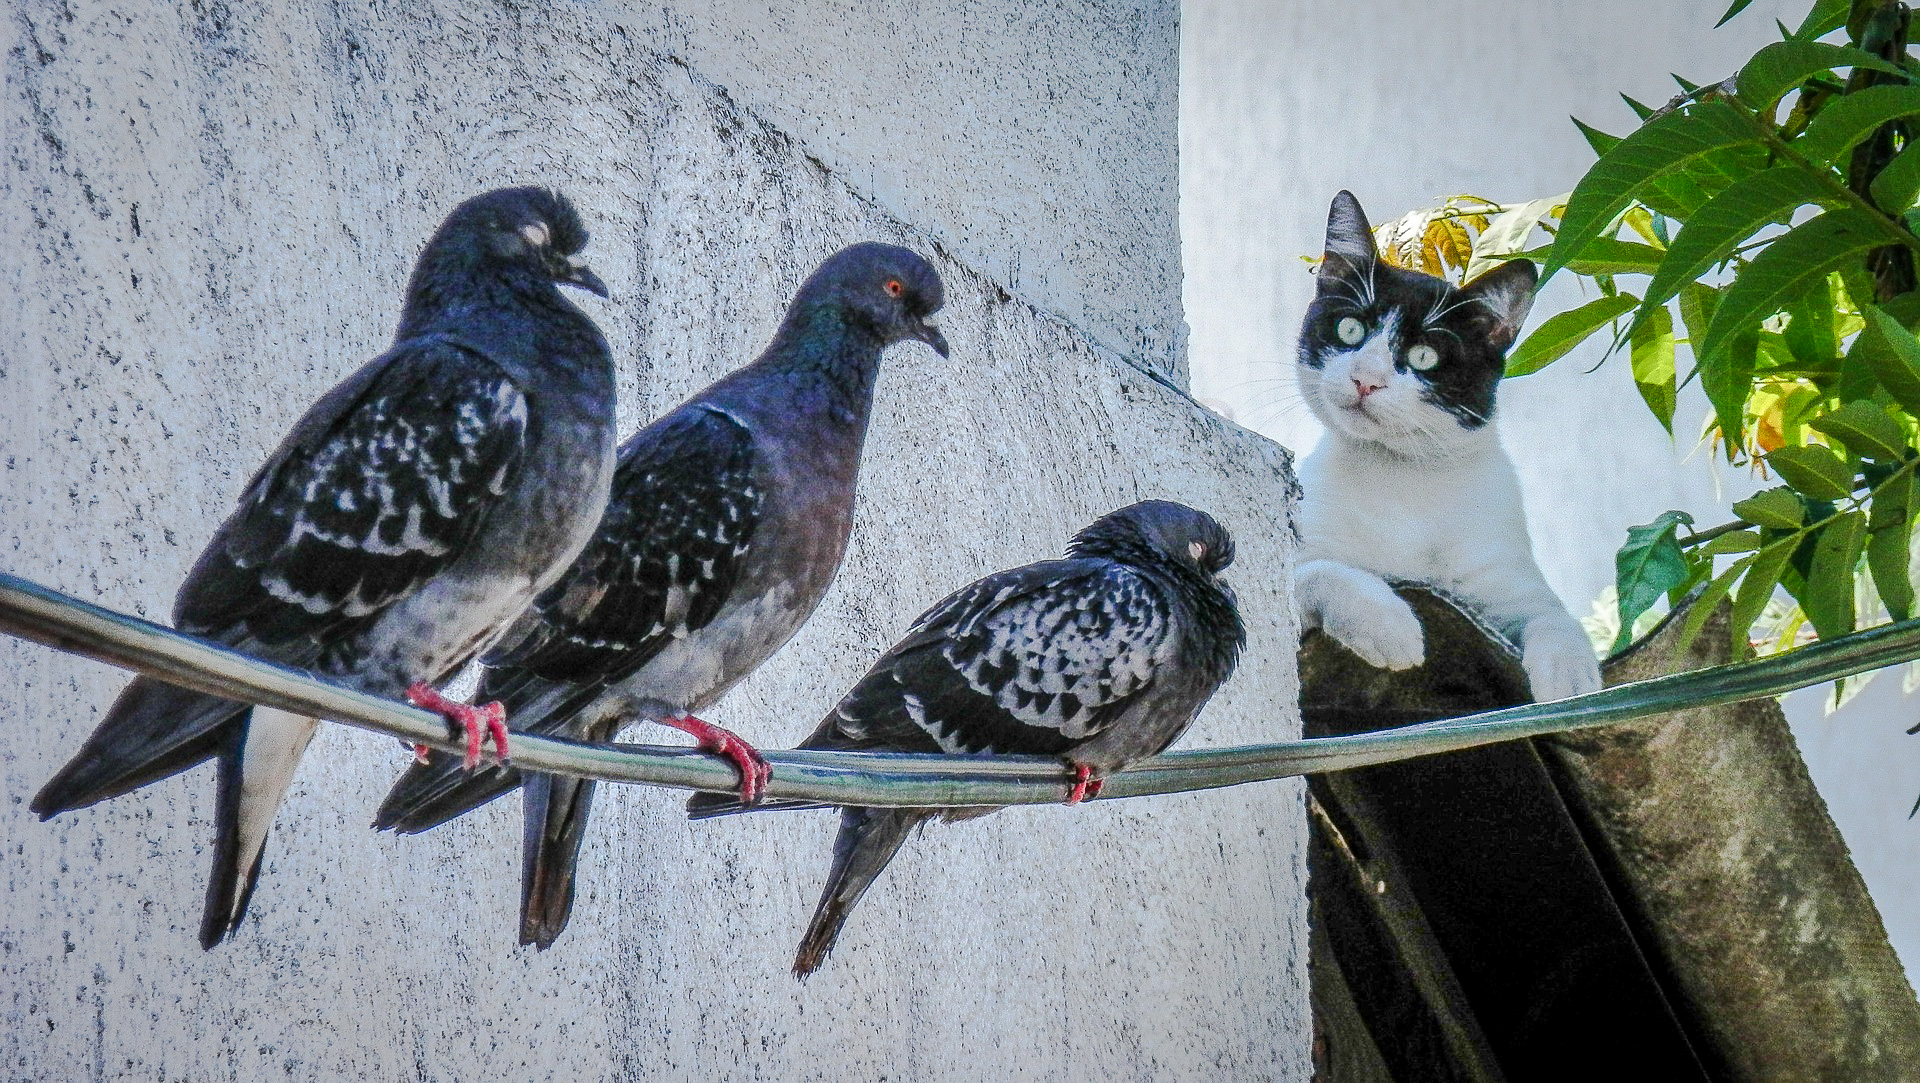 3 birds and cat